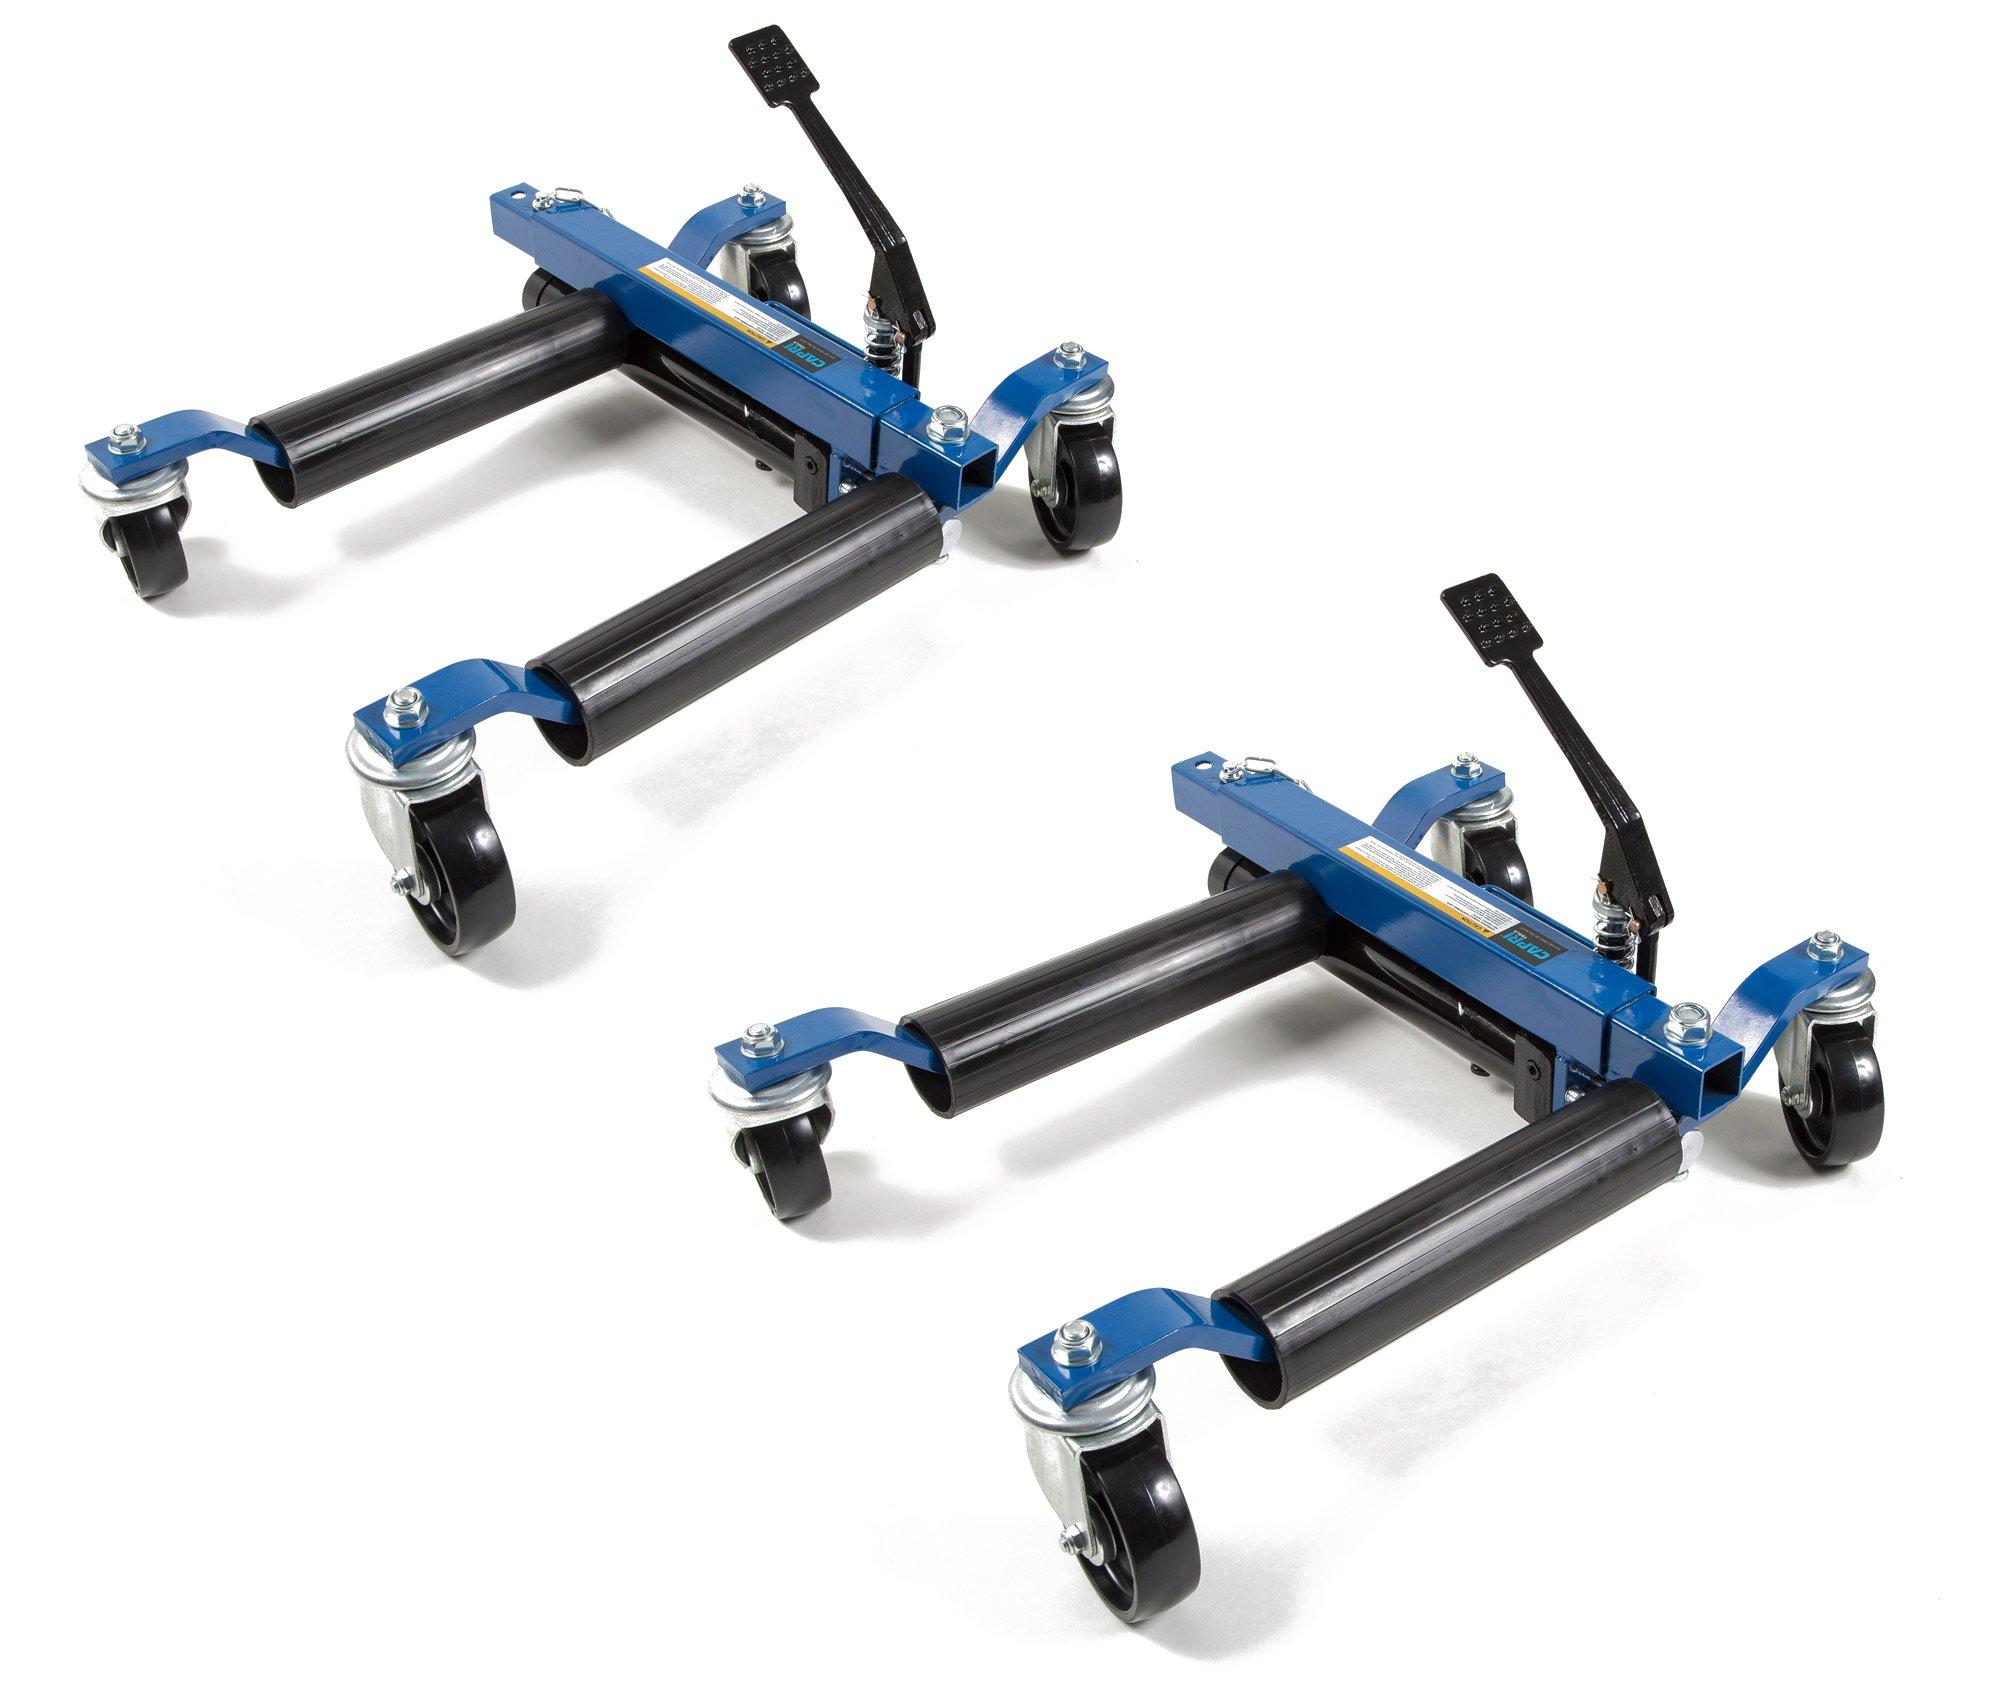 Capri Tools 21084-2PK Hydraulic Car Positioning 9'' Tire Jack/Dolly (2 Pack)